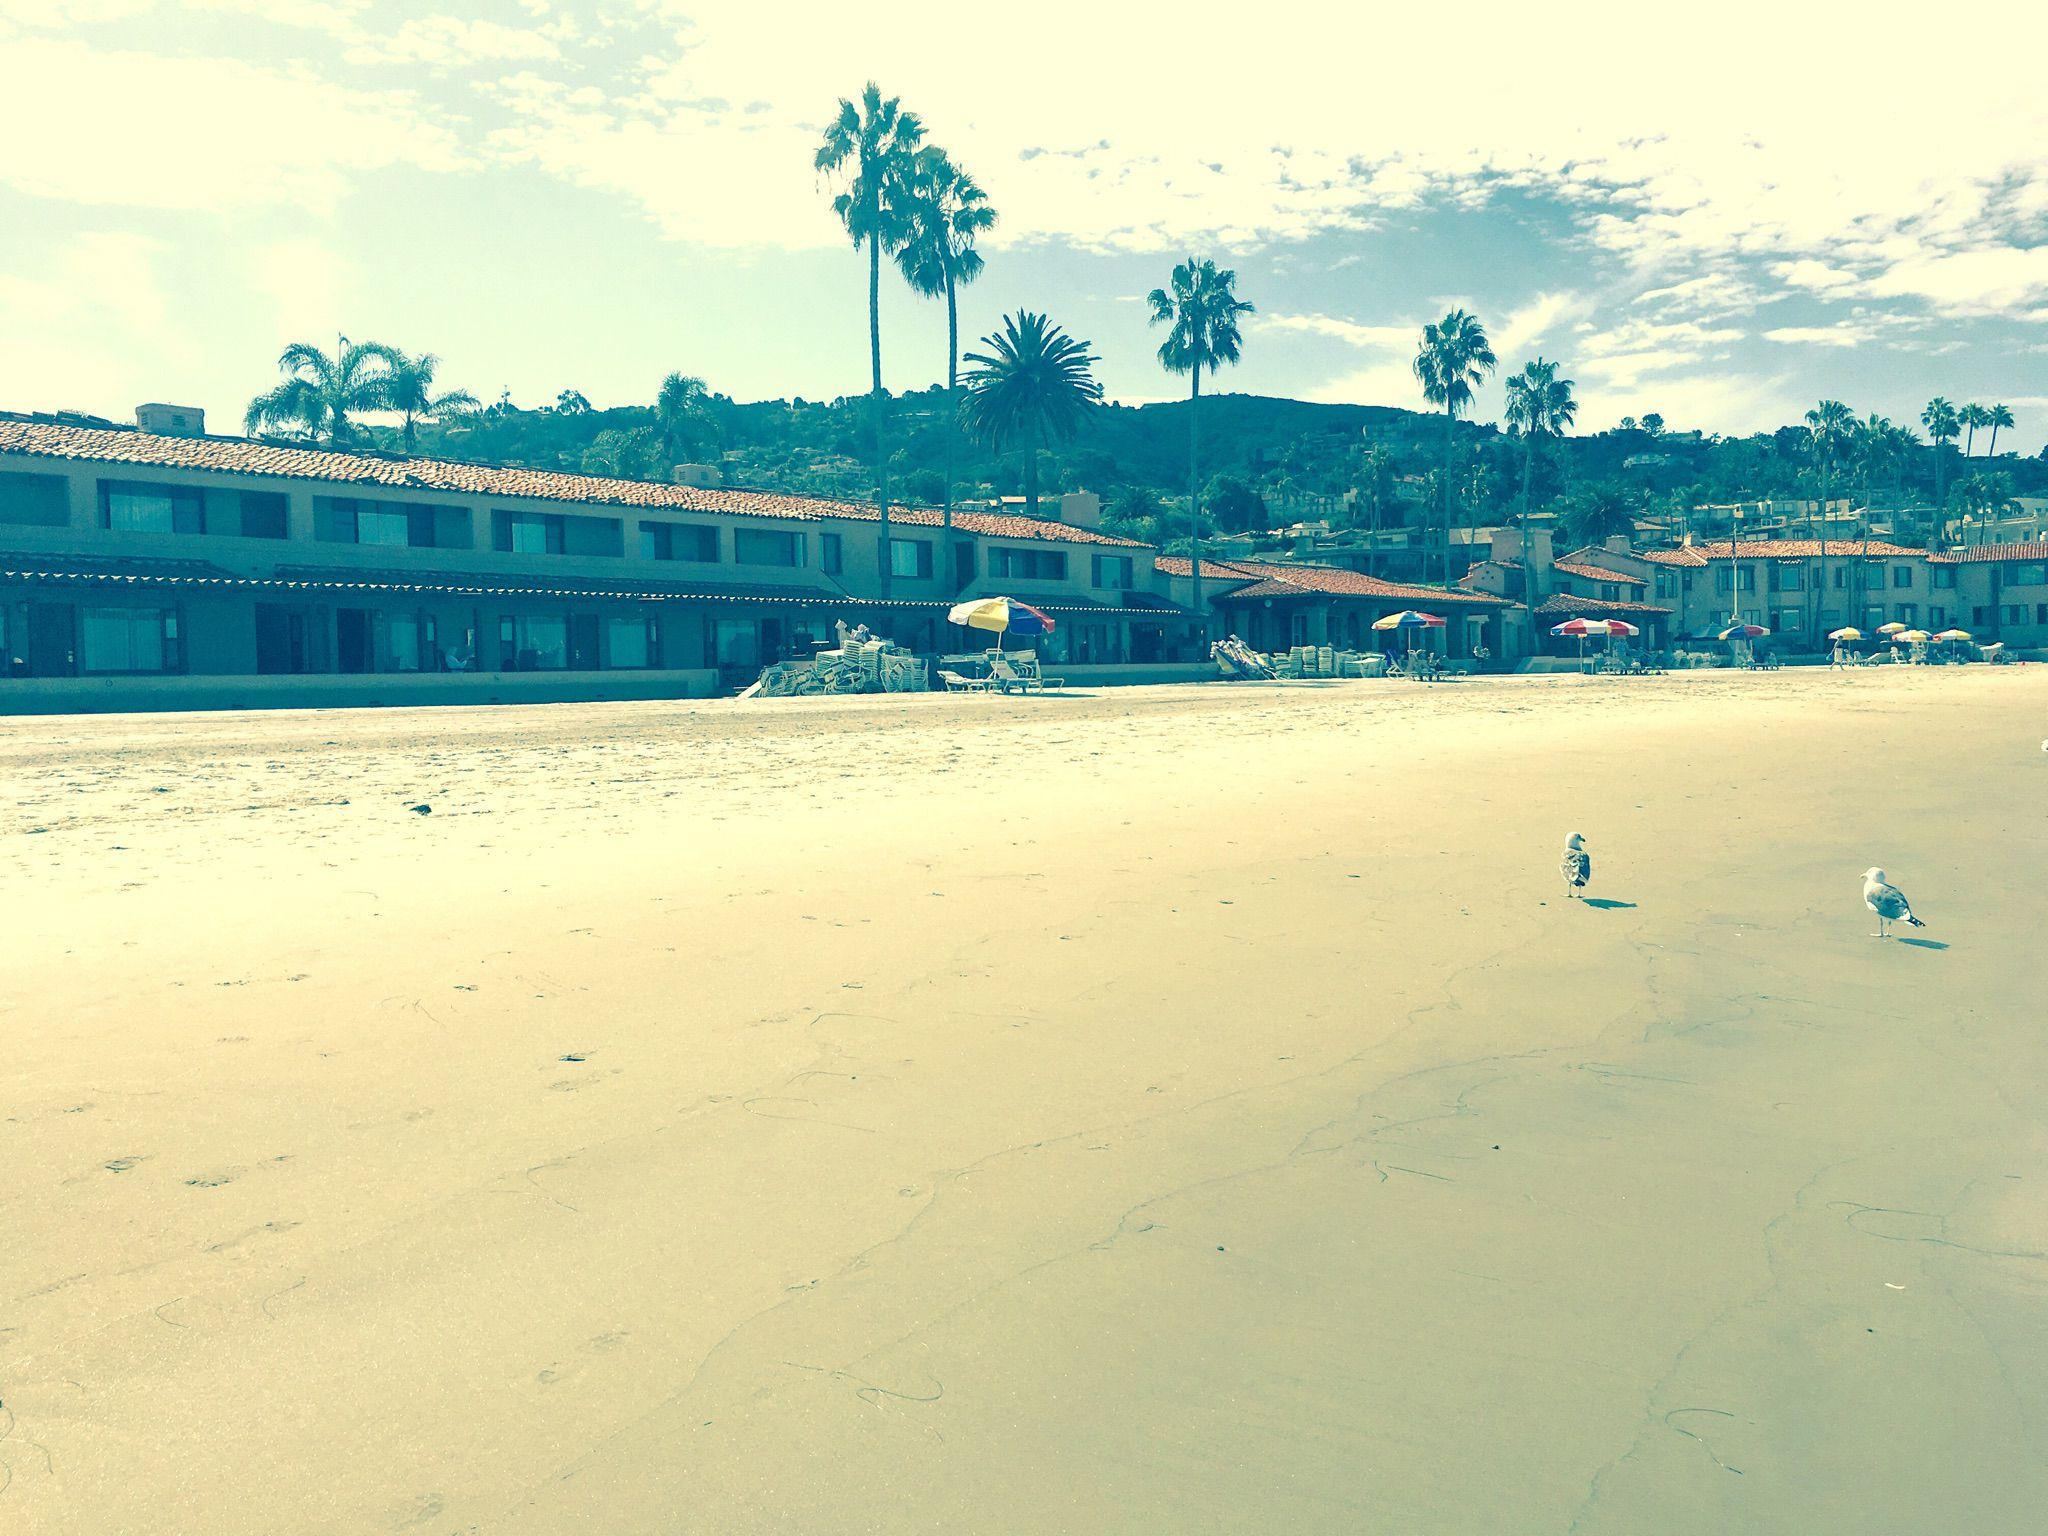 Little walk down the beach on this fine Thursday!